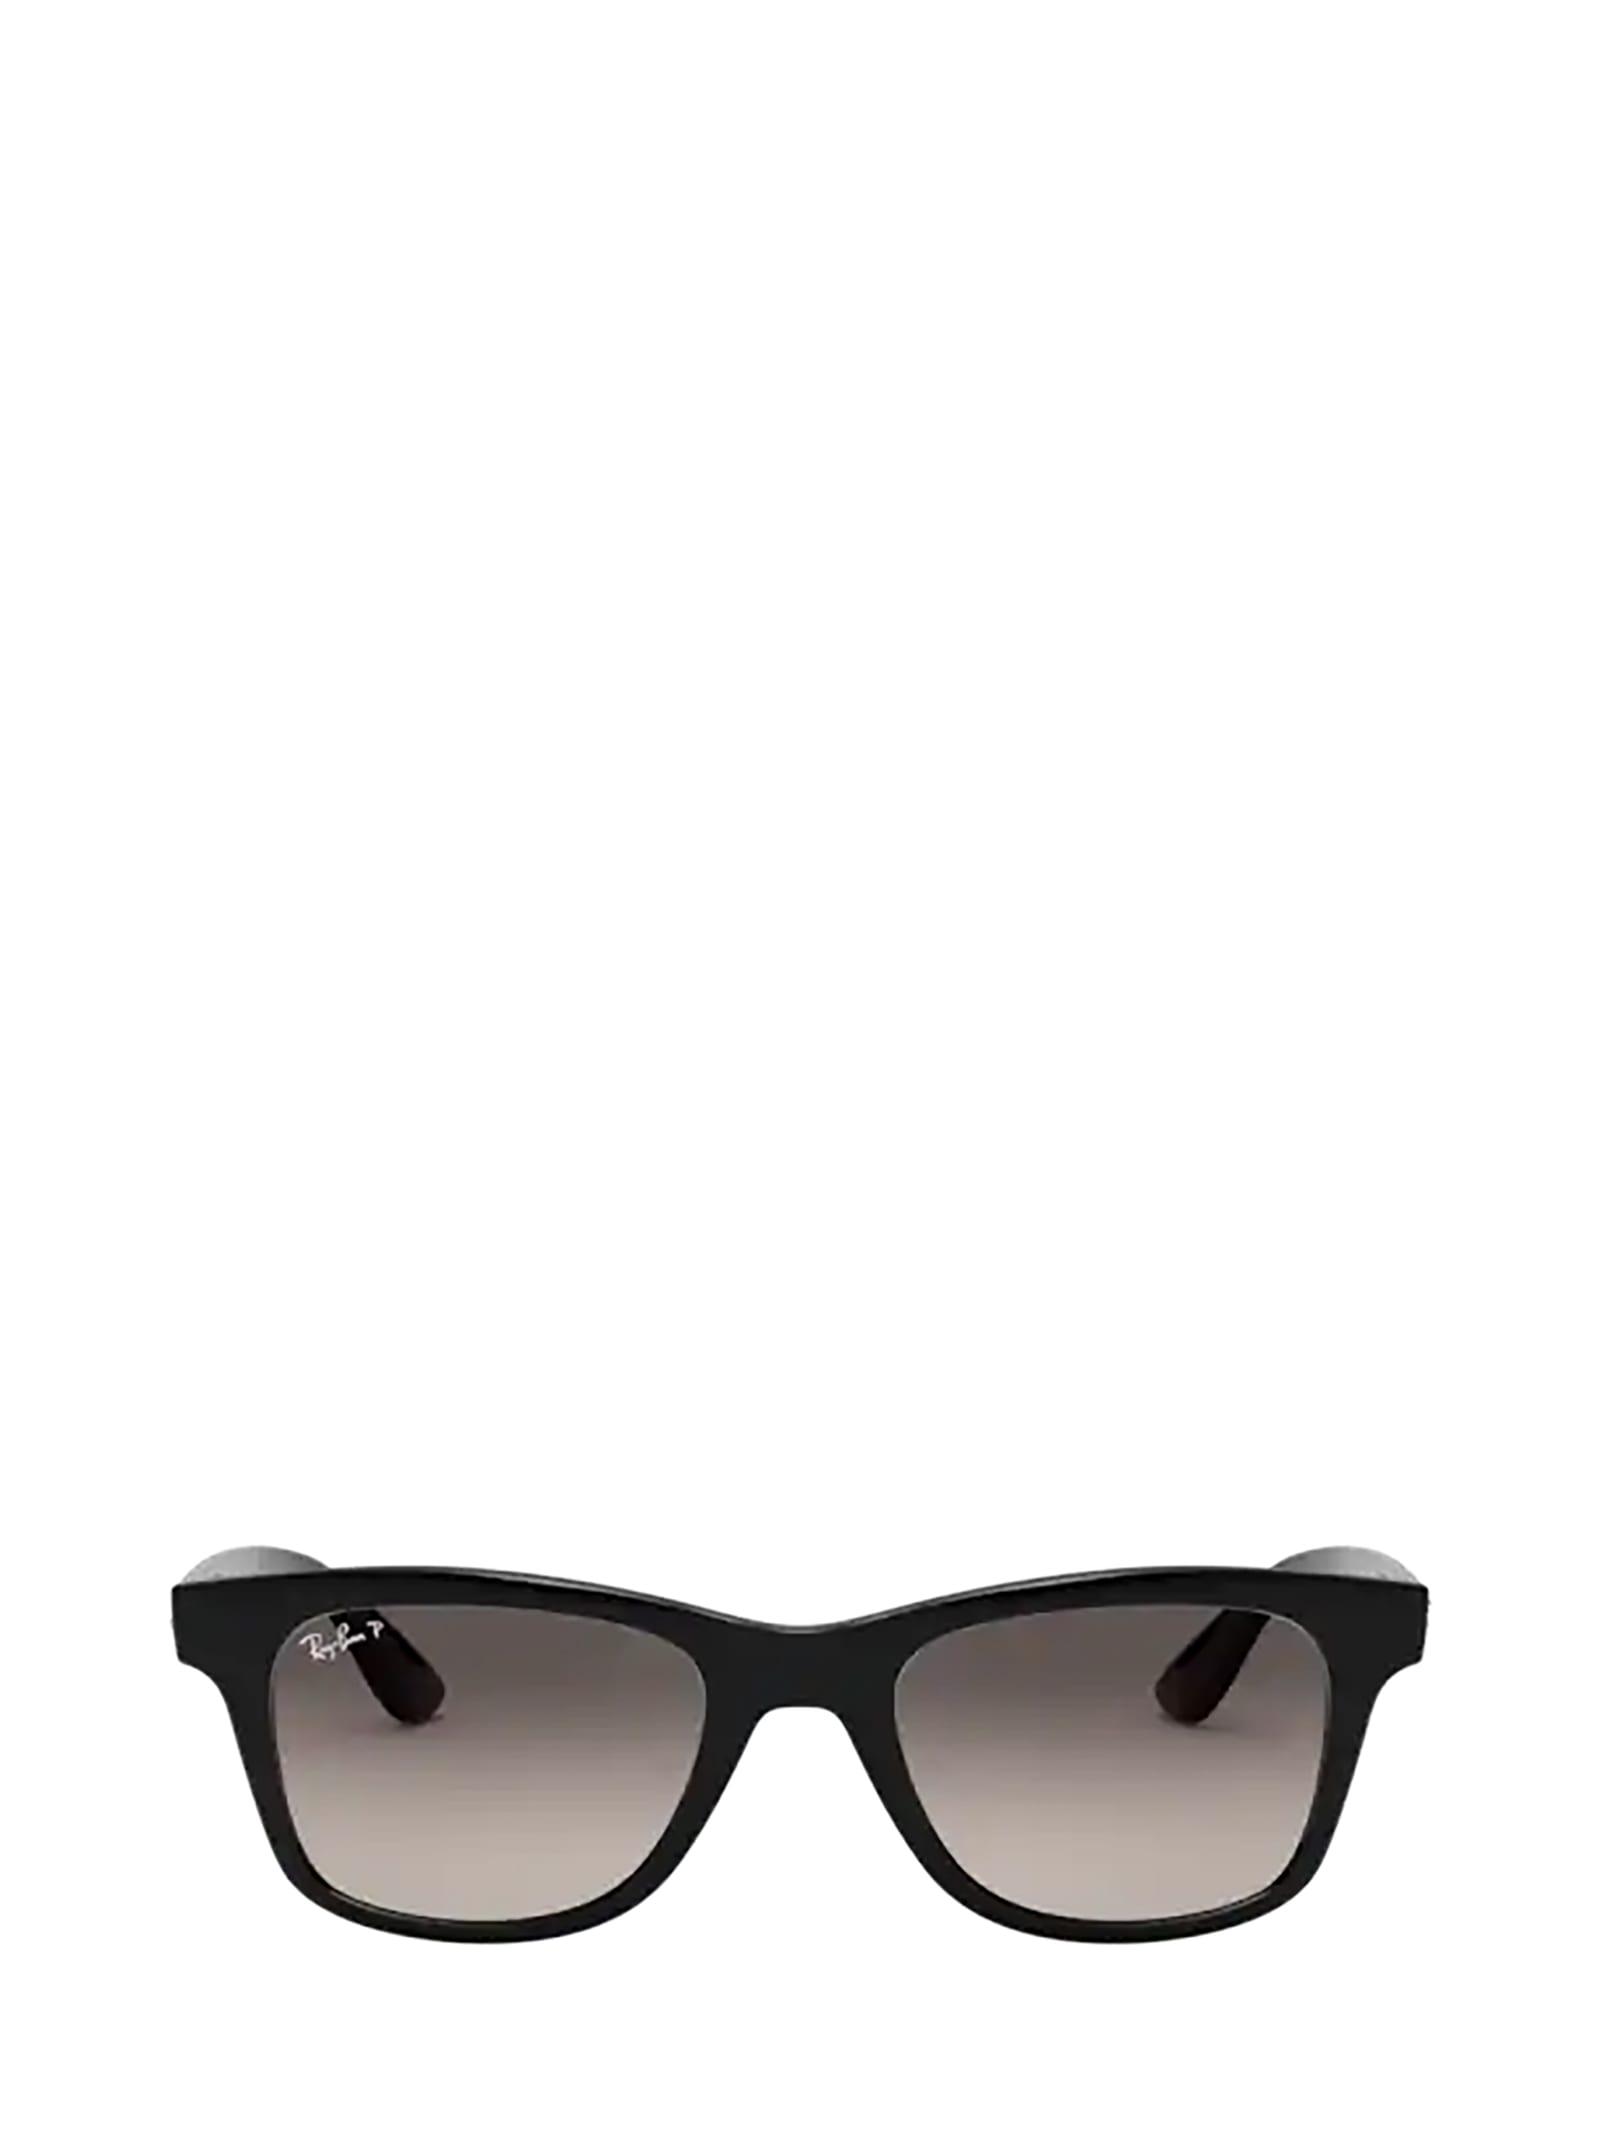 Ray-Ban Ray-ban Rb4640 Black Sunglasses